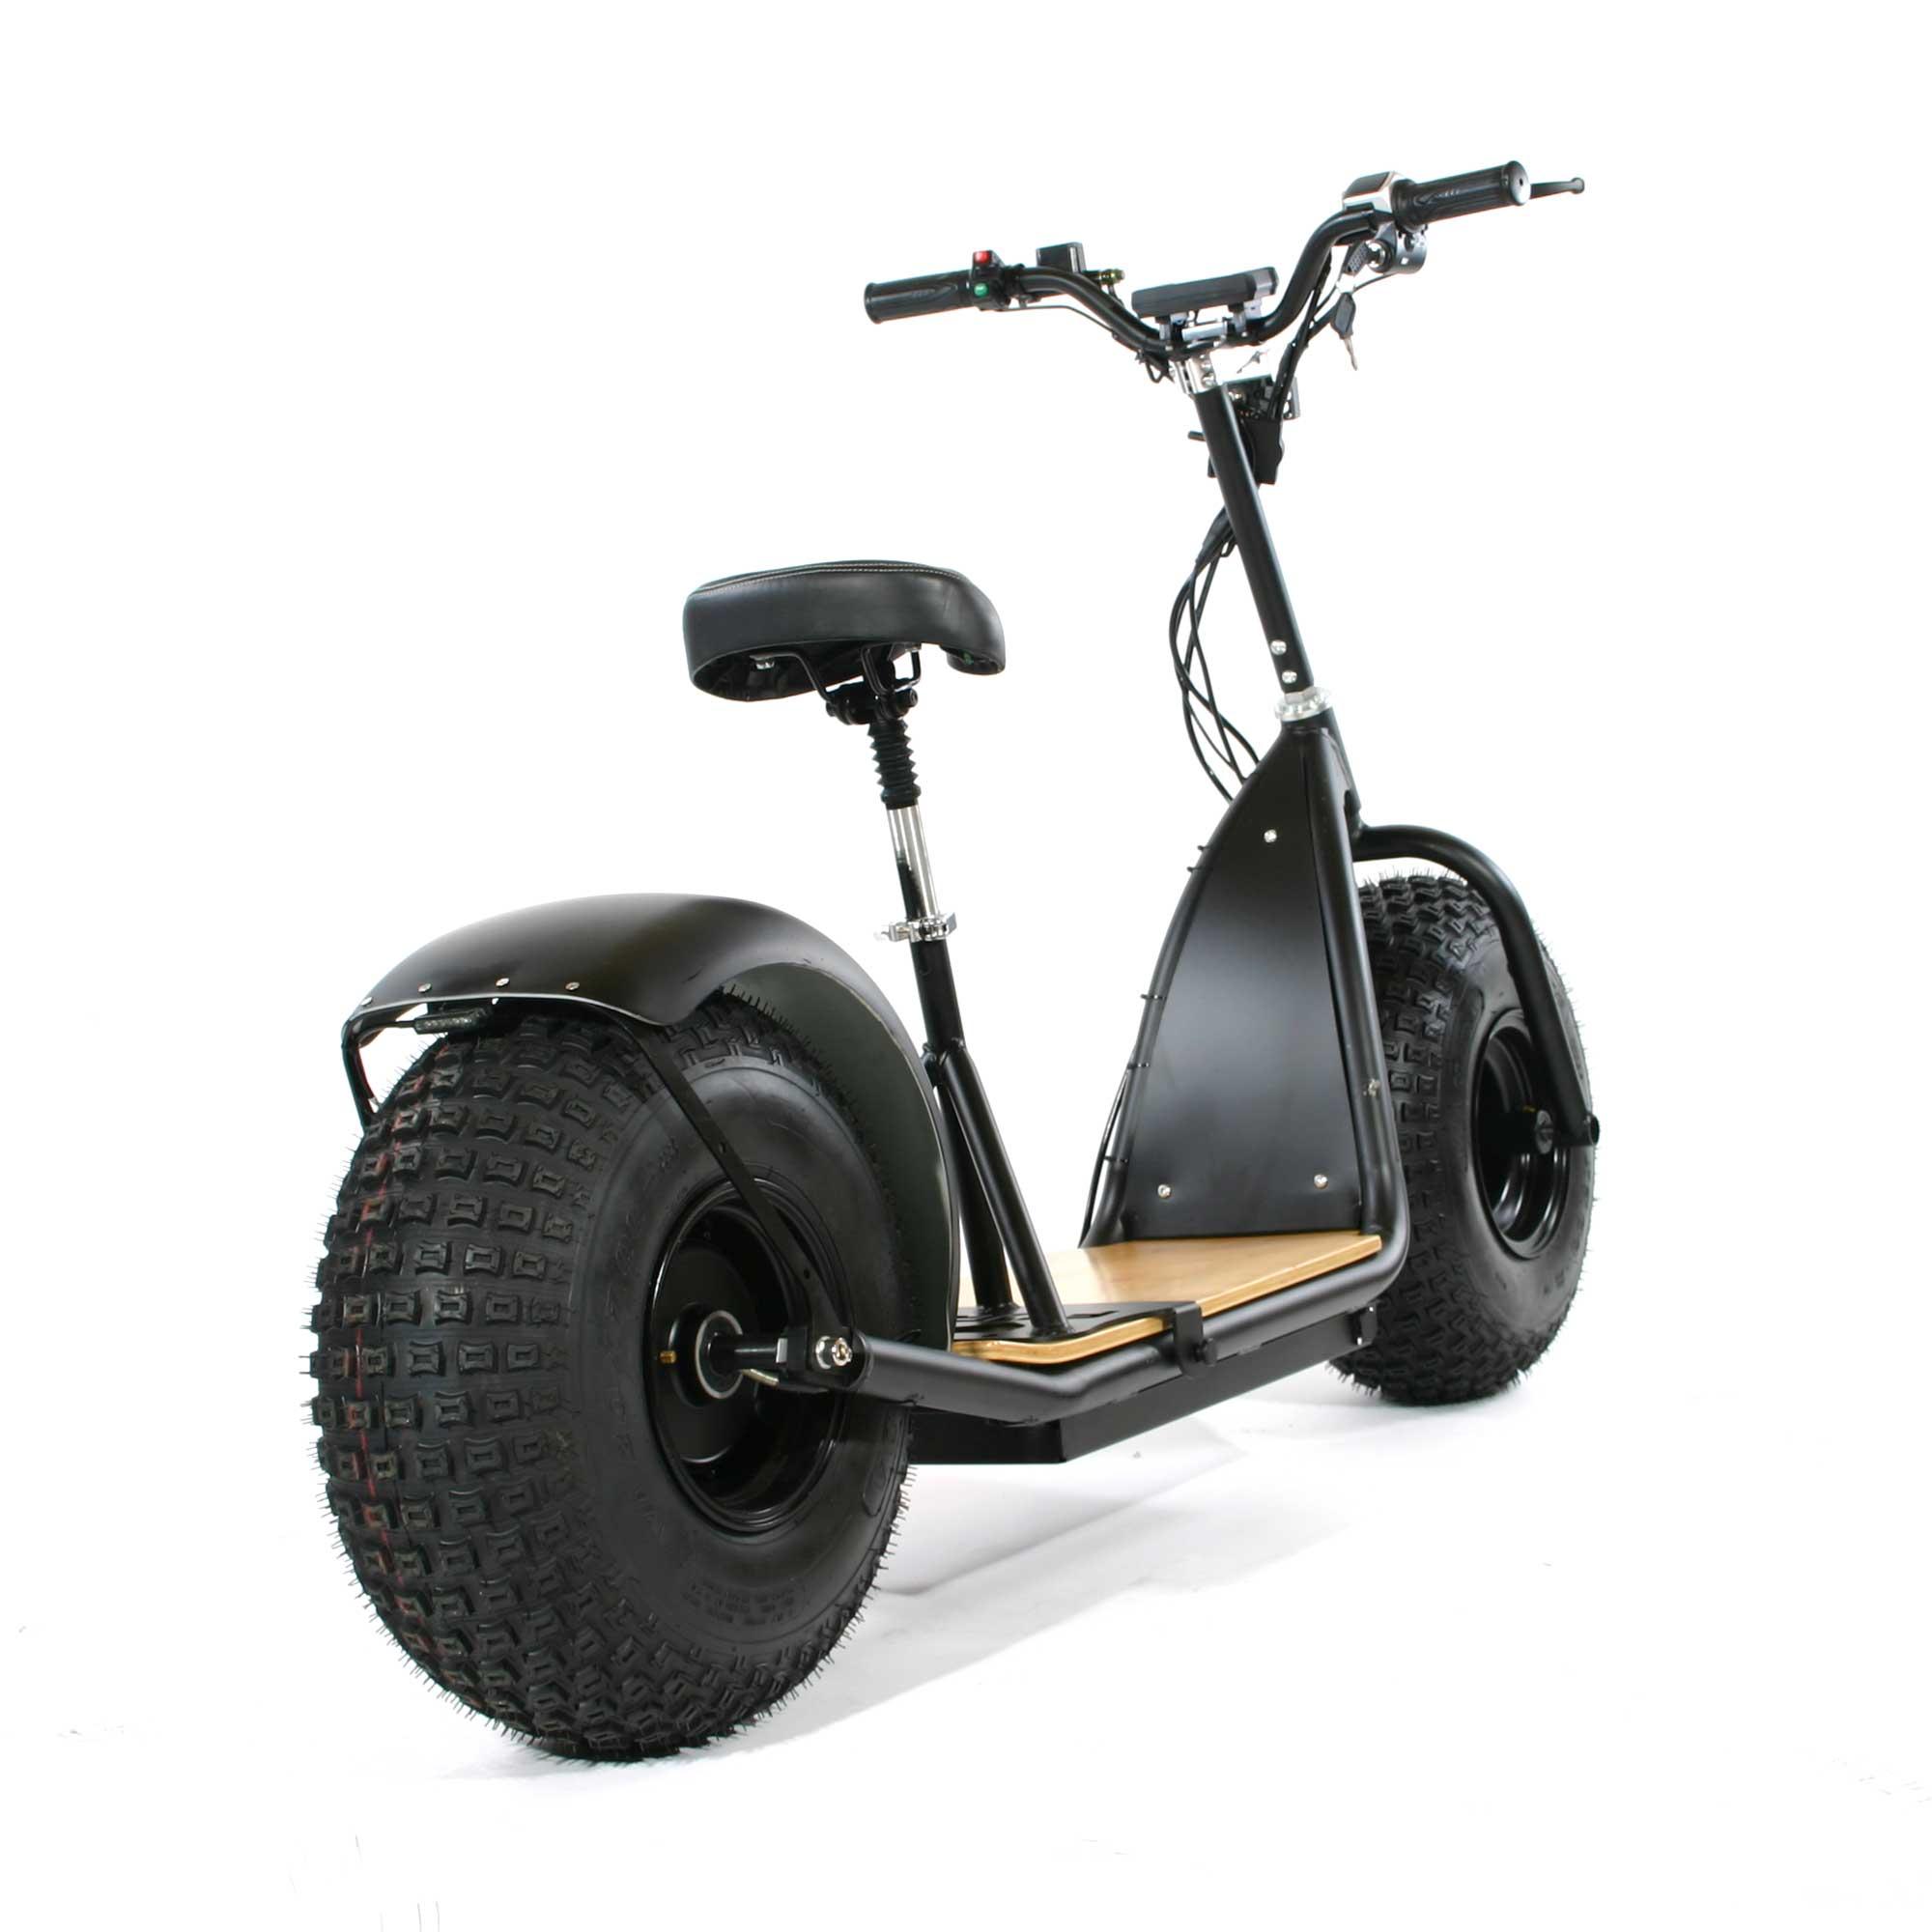 forca knumo 48v 1000w sxx fat wheel e scooter mit cruise reifenprofil e scooter. Black Bedroom Furniture Sets. Home Design Ideas